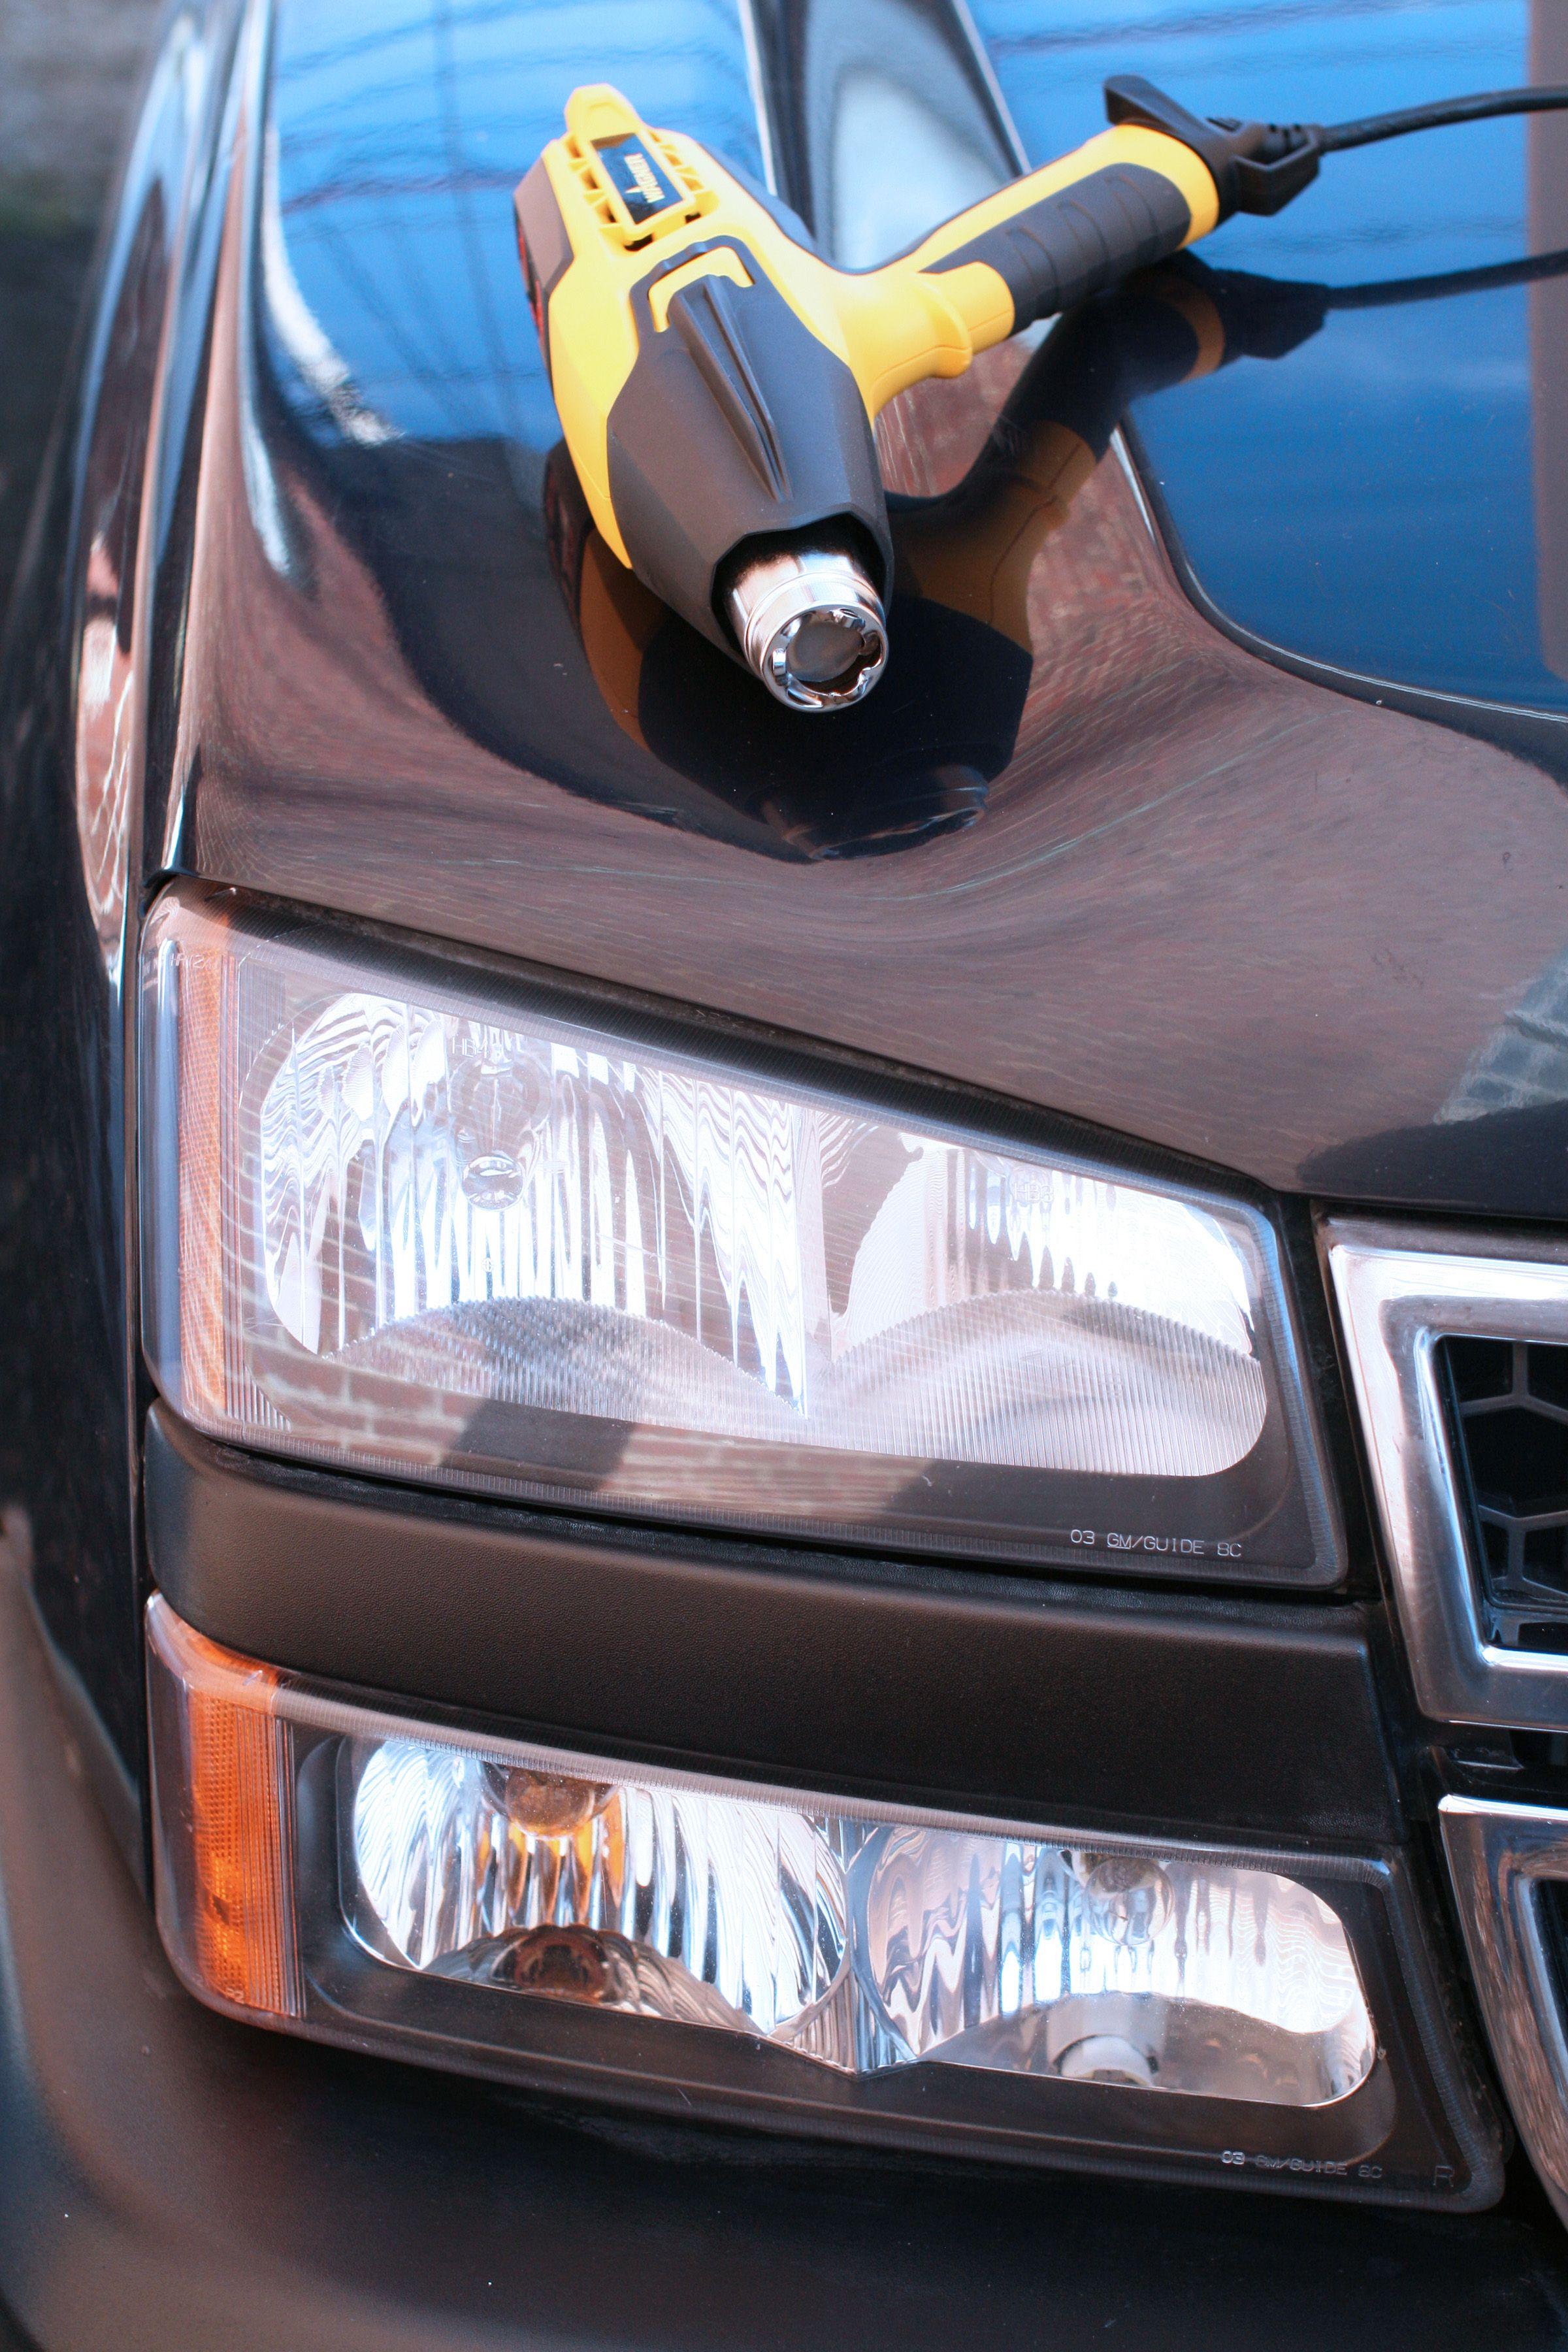 Car colour heat - How To Fix Foggy Car Headlights With A Heat Gun